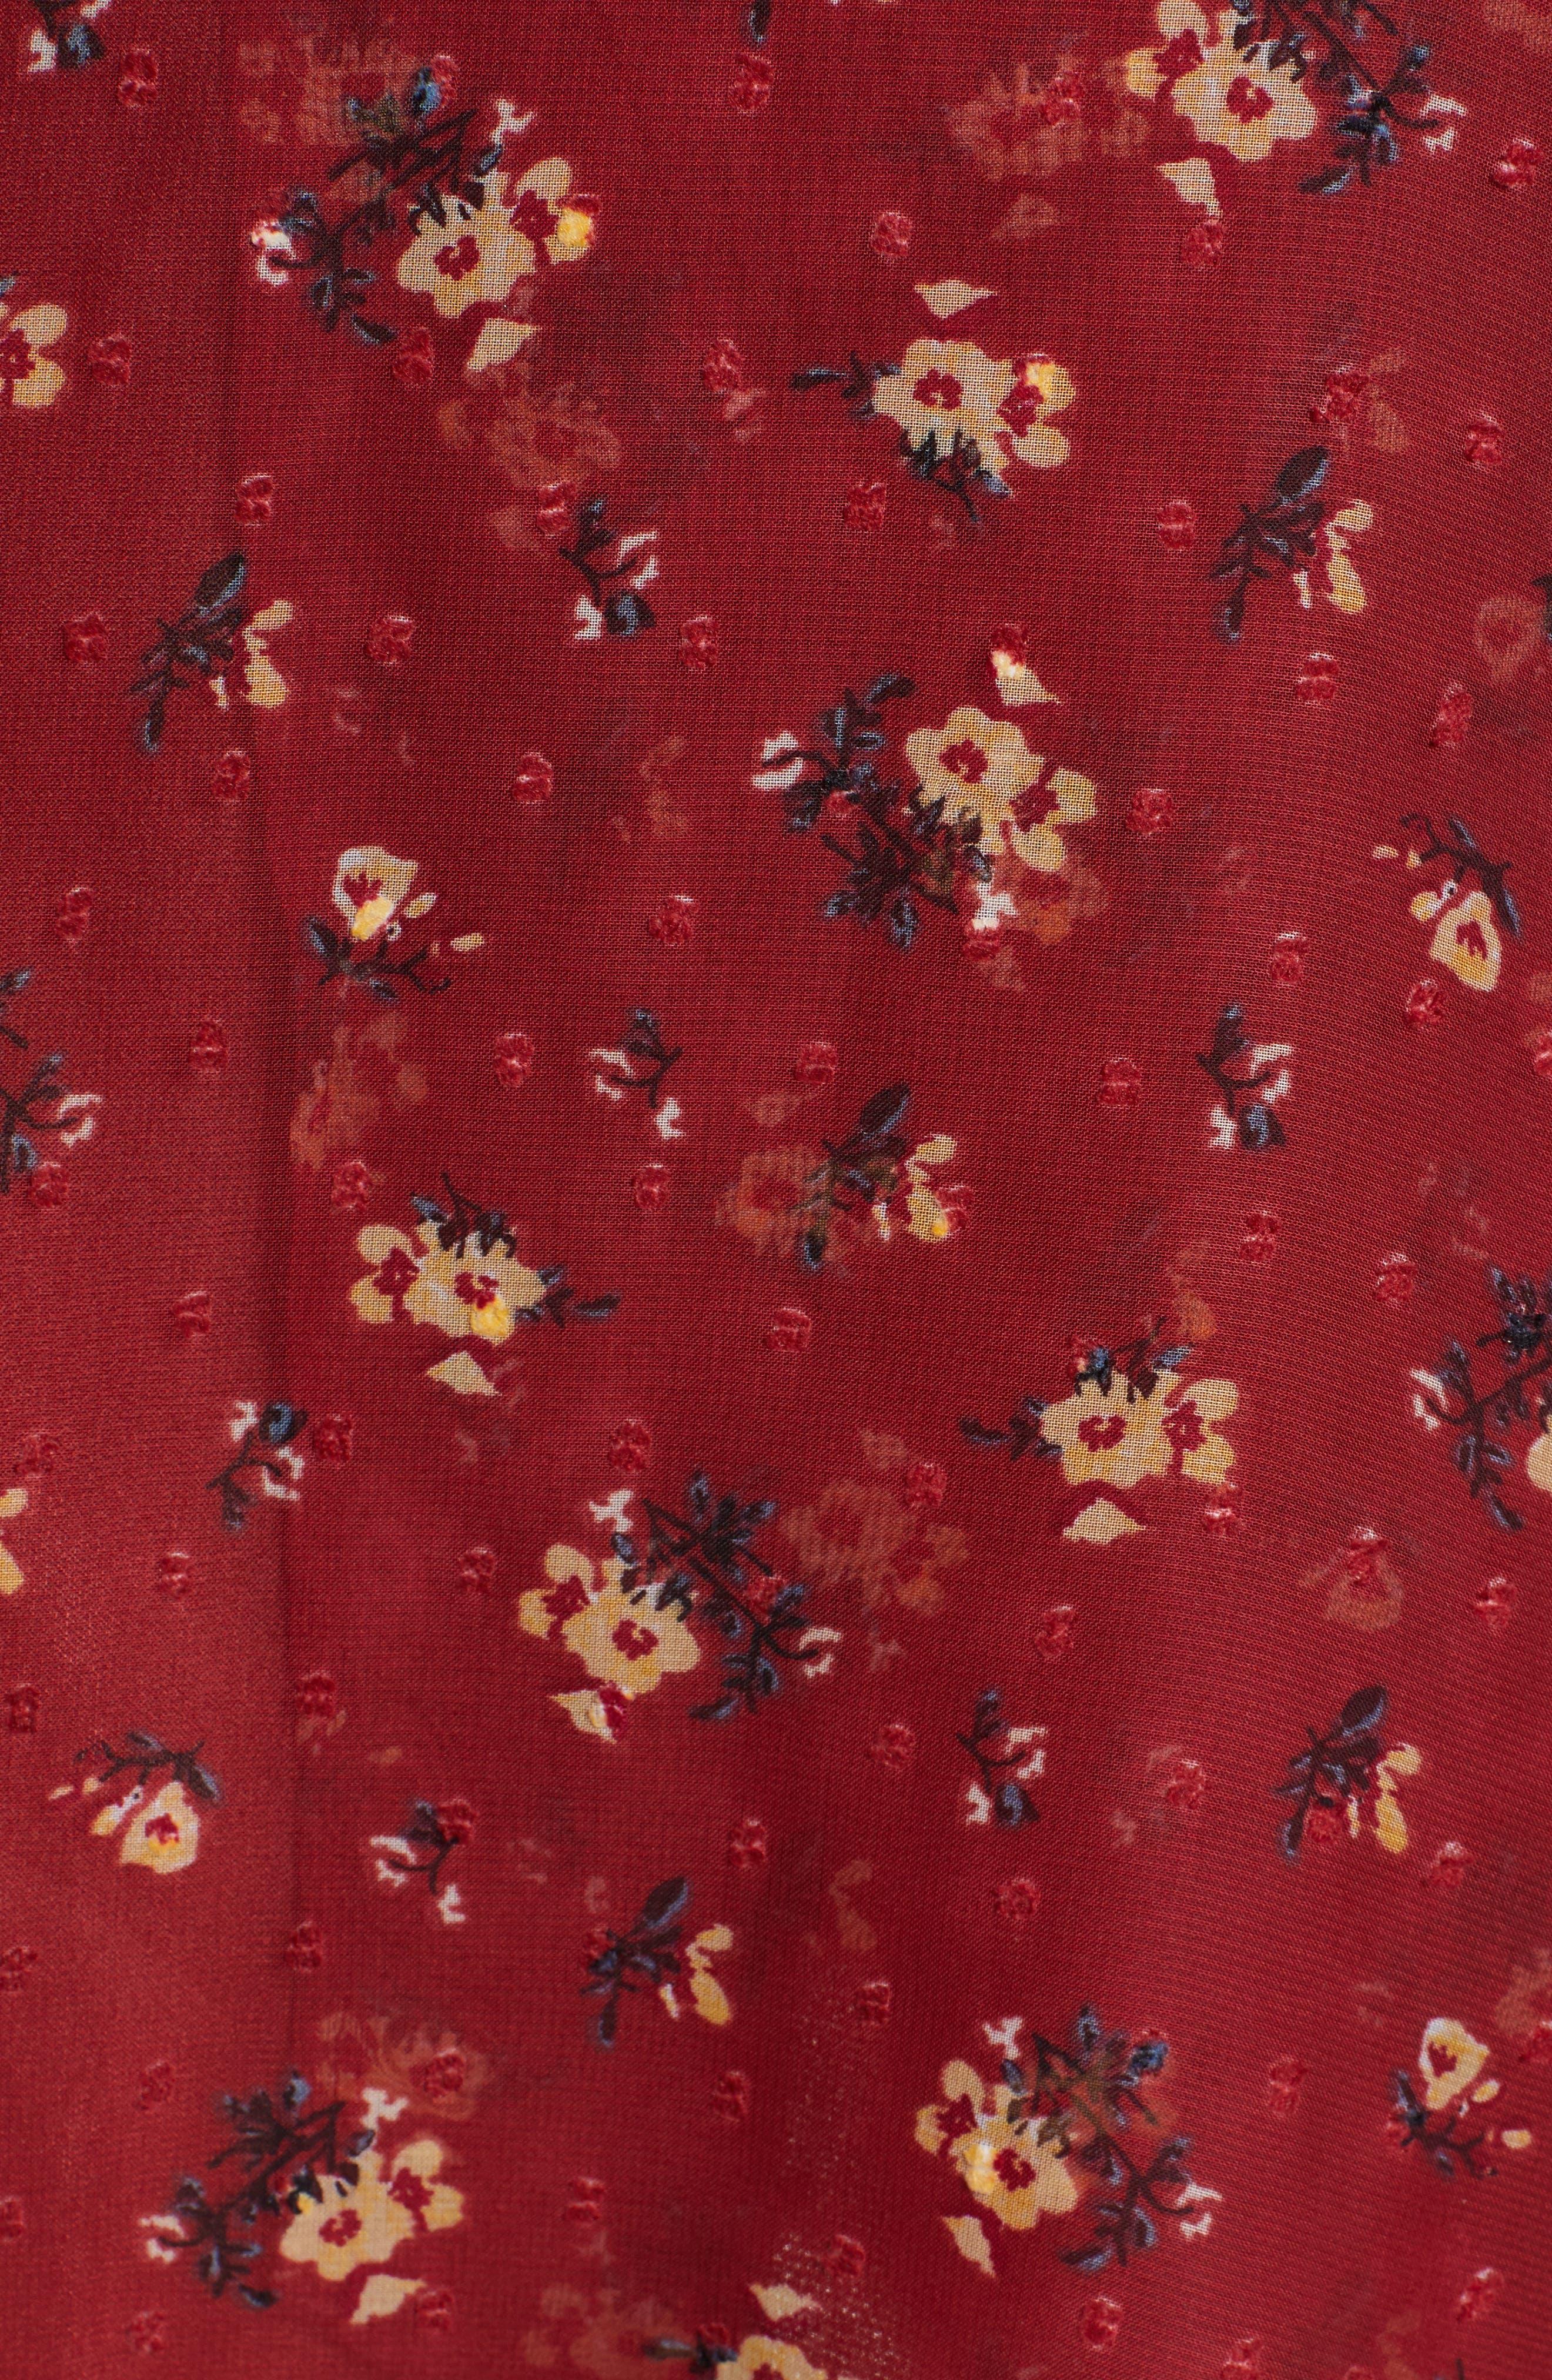 Floral Print Dress,                             Alternate thumbnail 6, color,                             BRICK